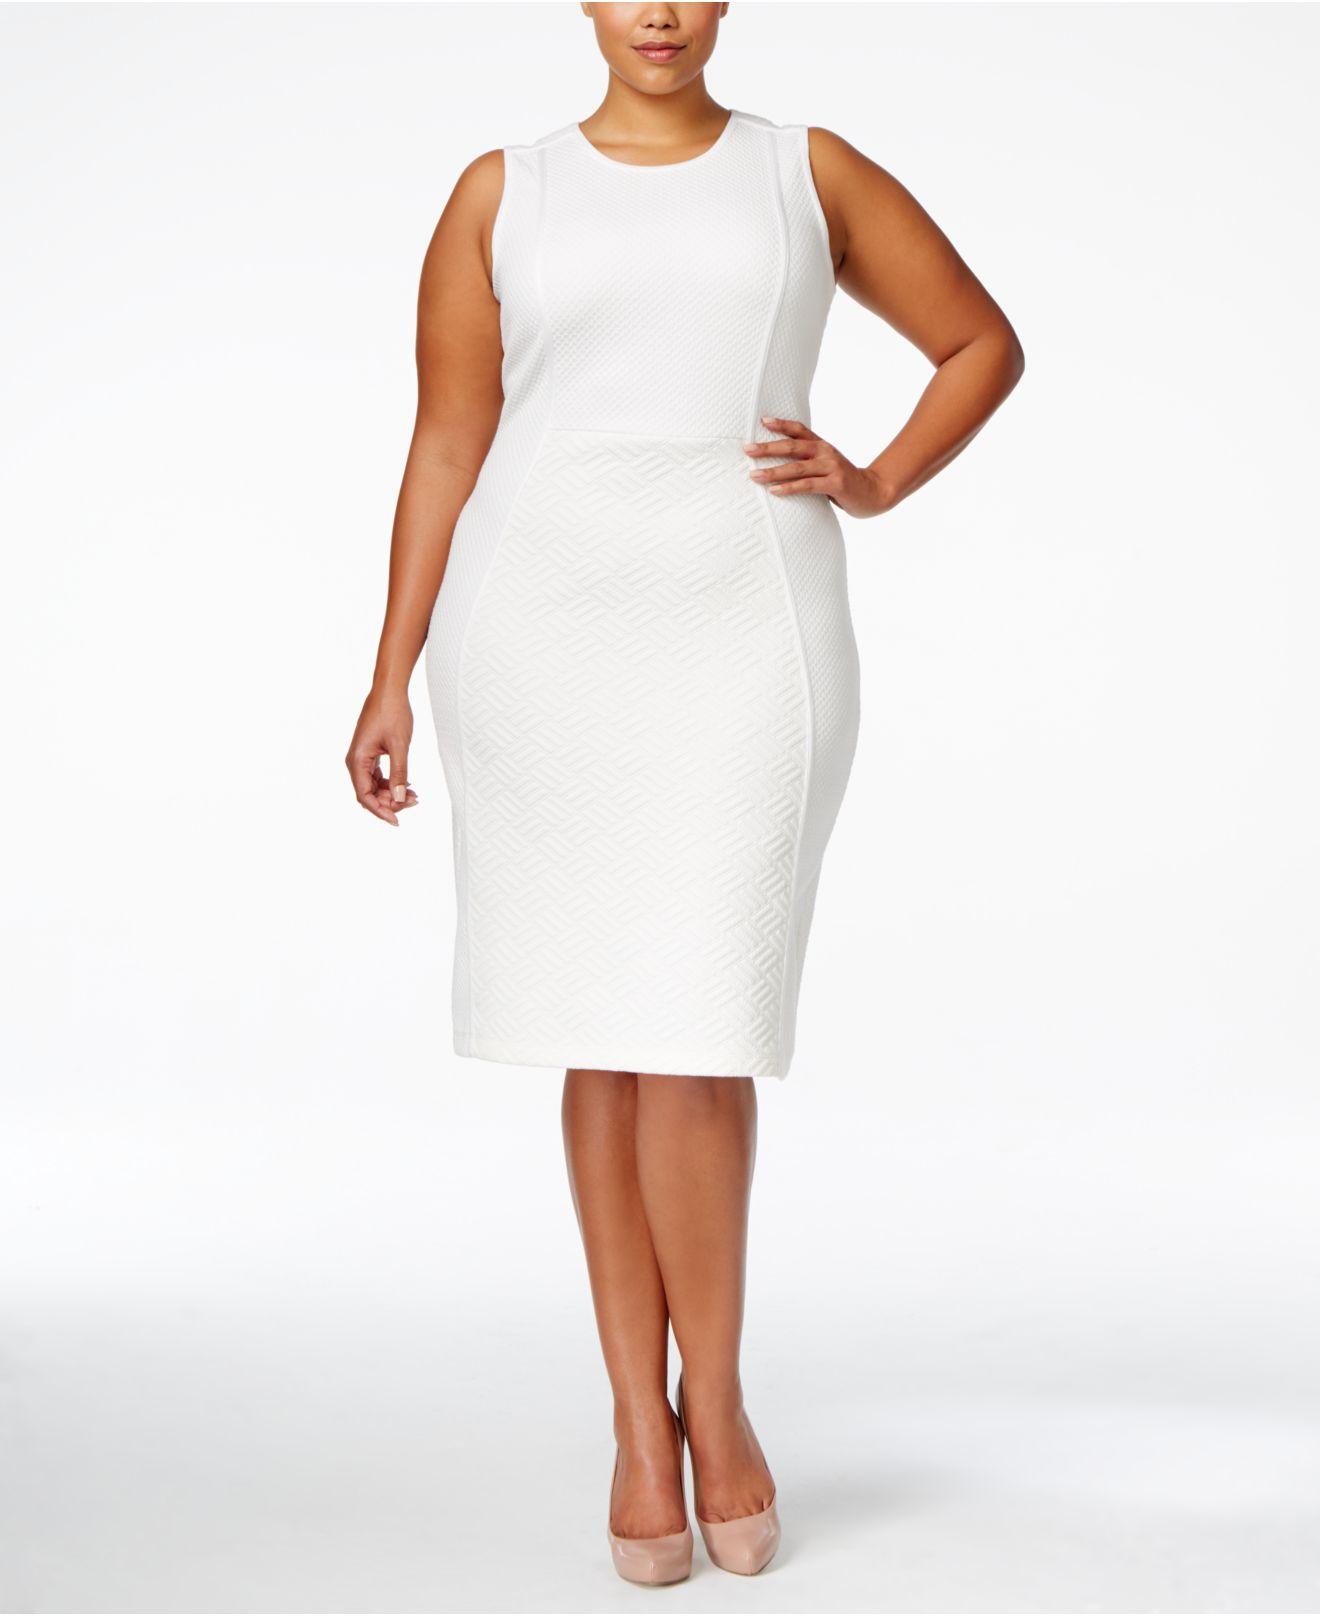 White Plus Size Sheath Dress – Fashion dresses